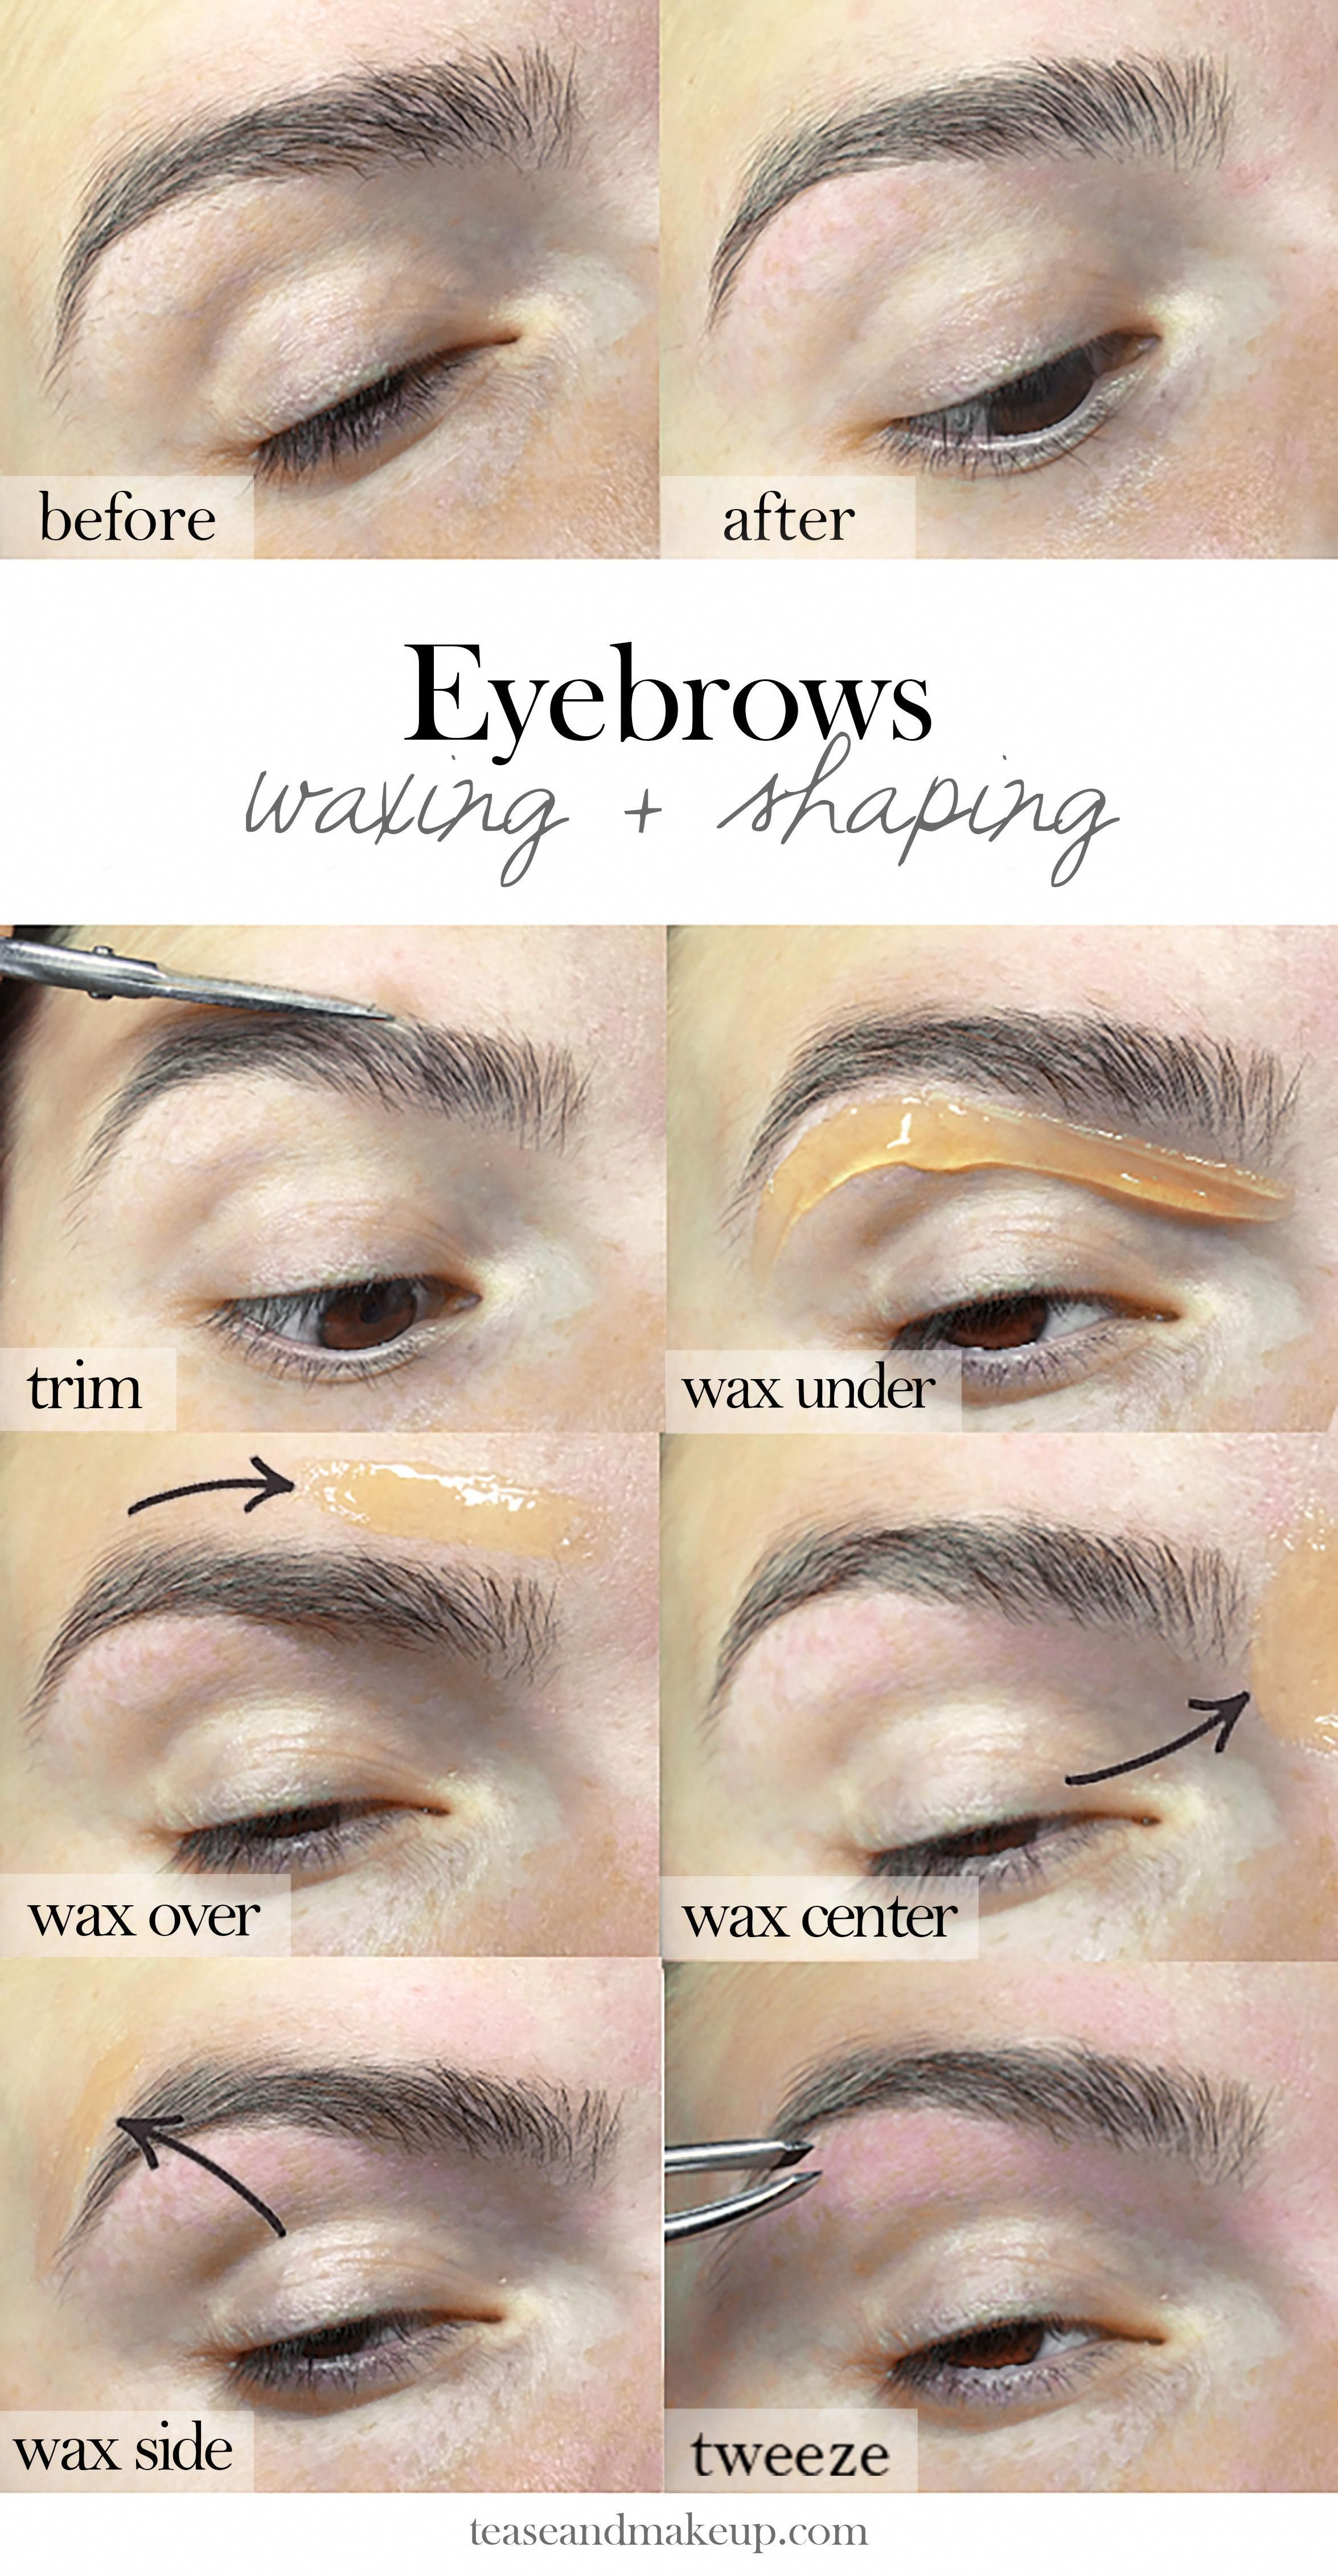 Where Can I Get My Eyebrows Threaded Waxed Thread Best Eyebrow